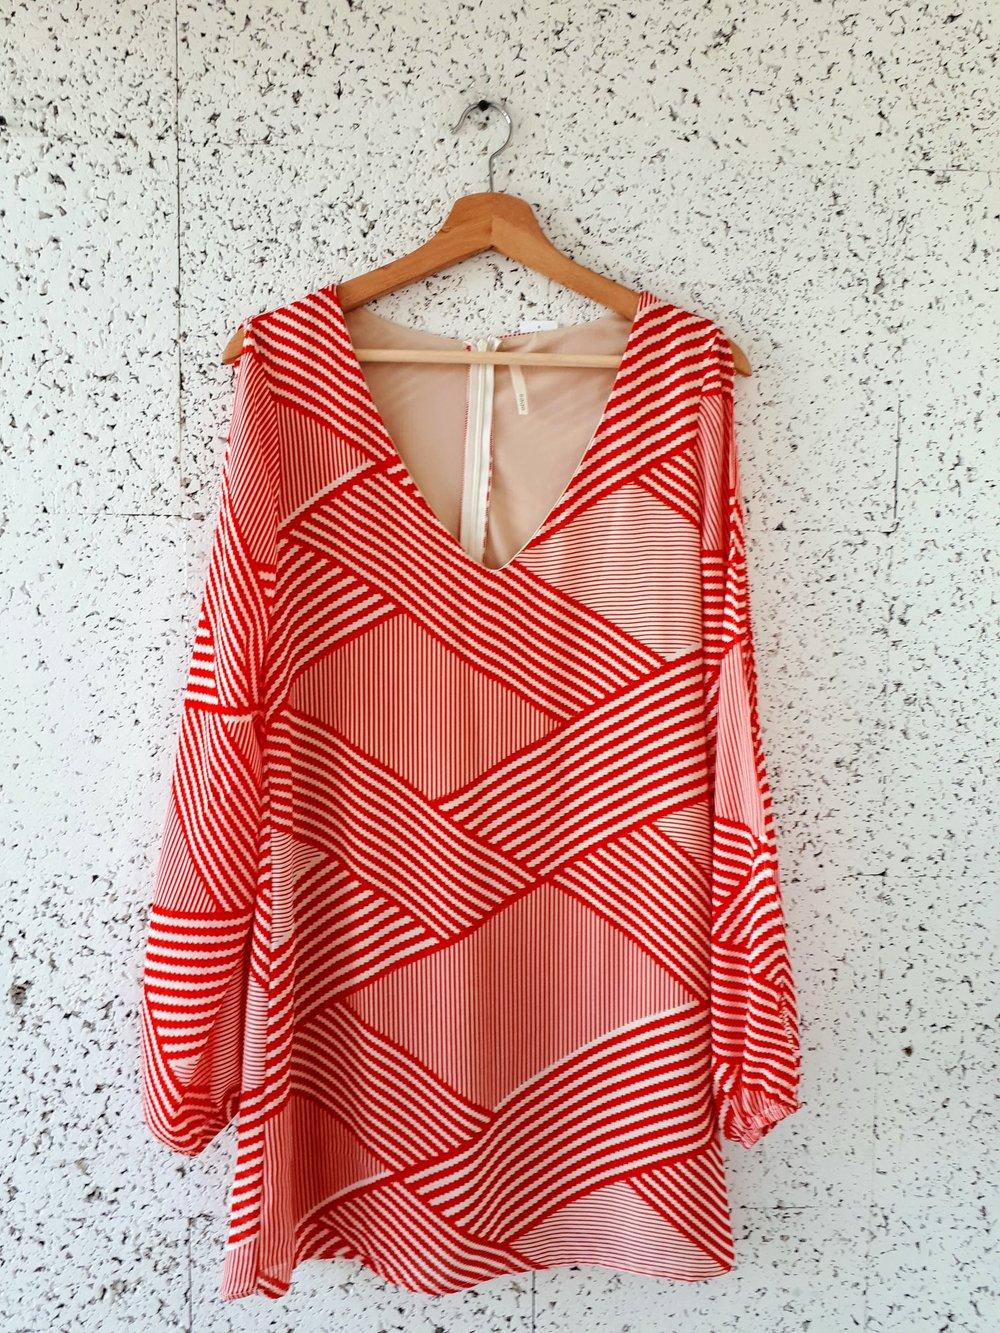 Sage dress; Size S, $28